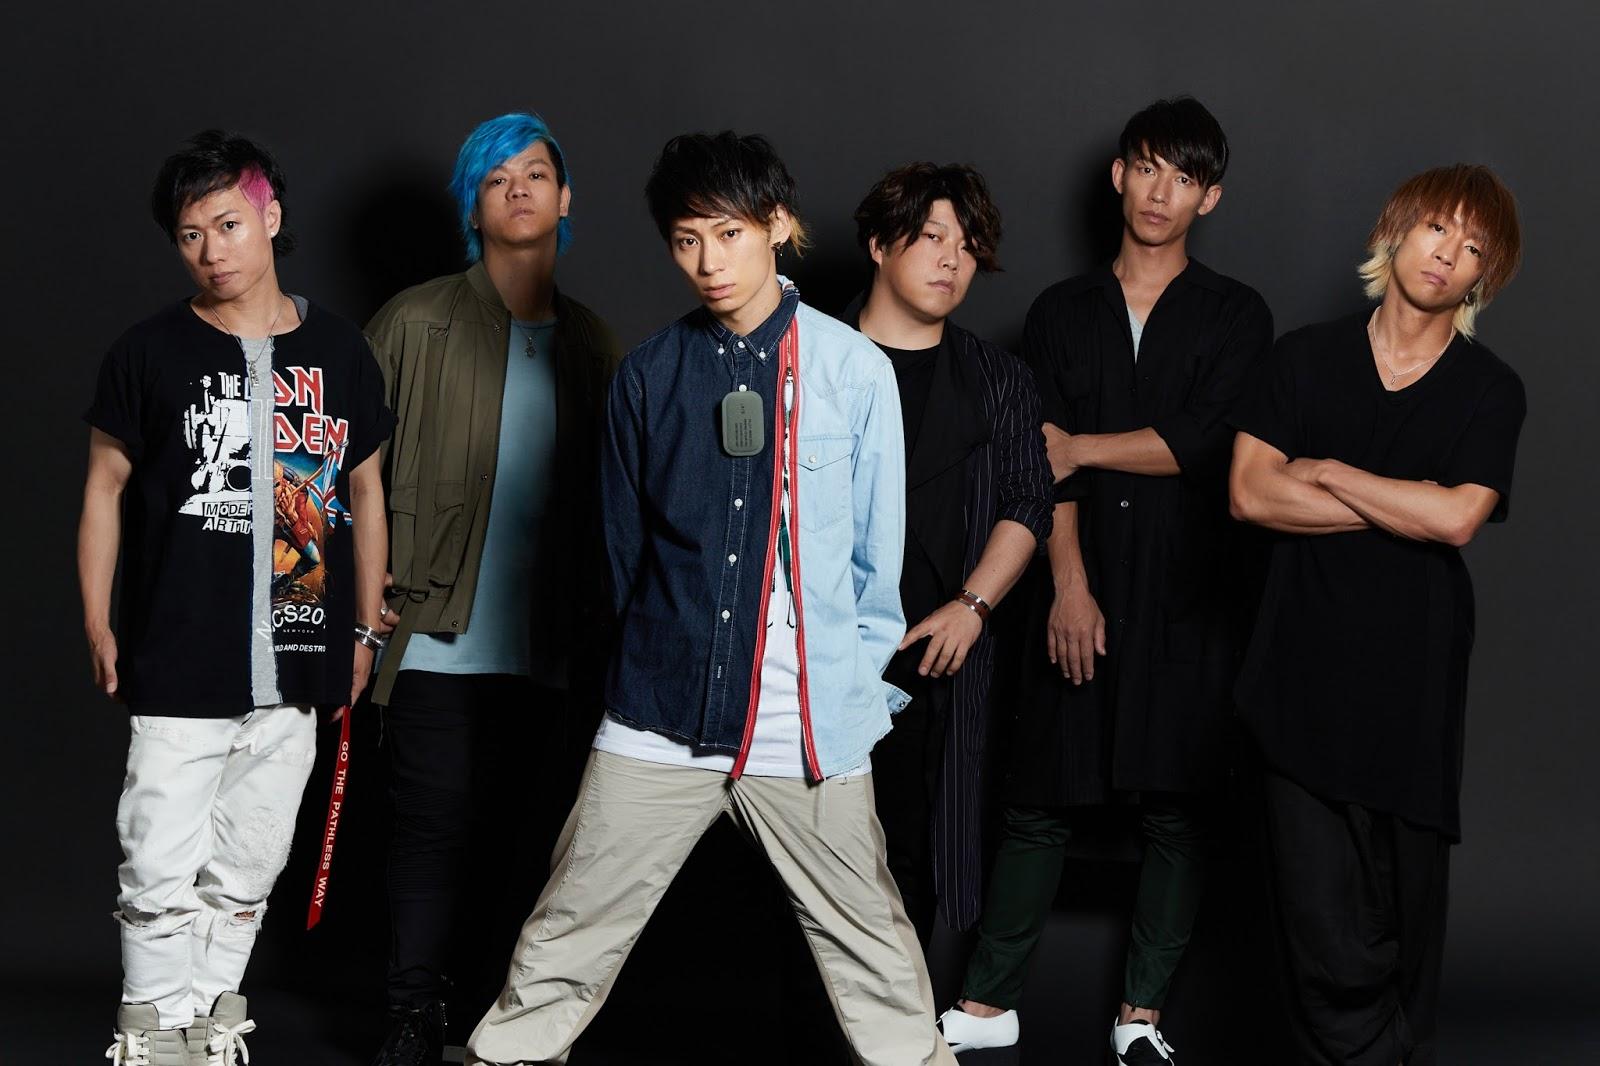 SONGLIST - UVERandom | UVERworld International Crew